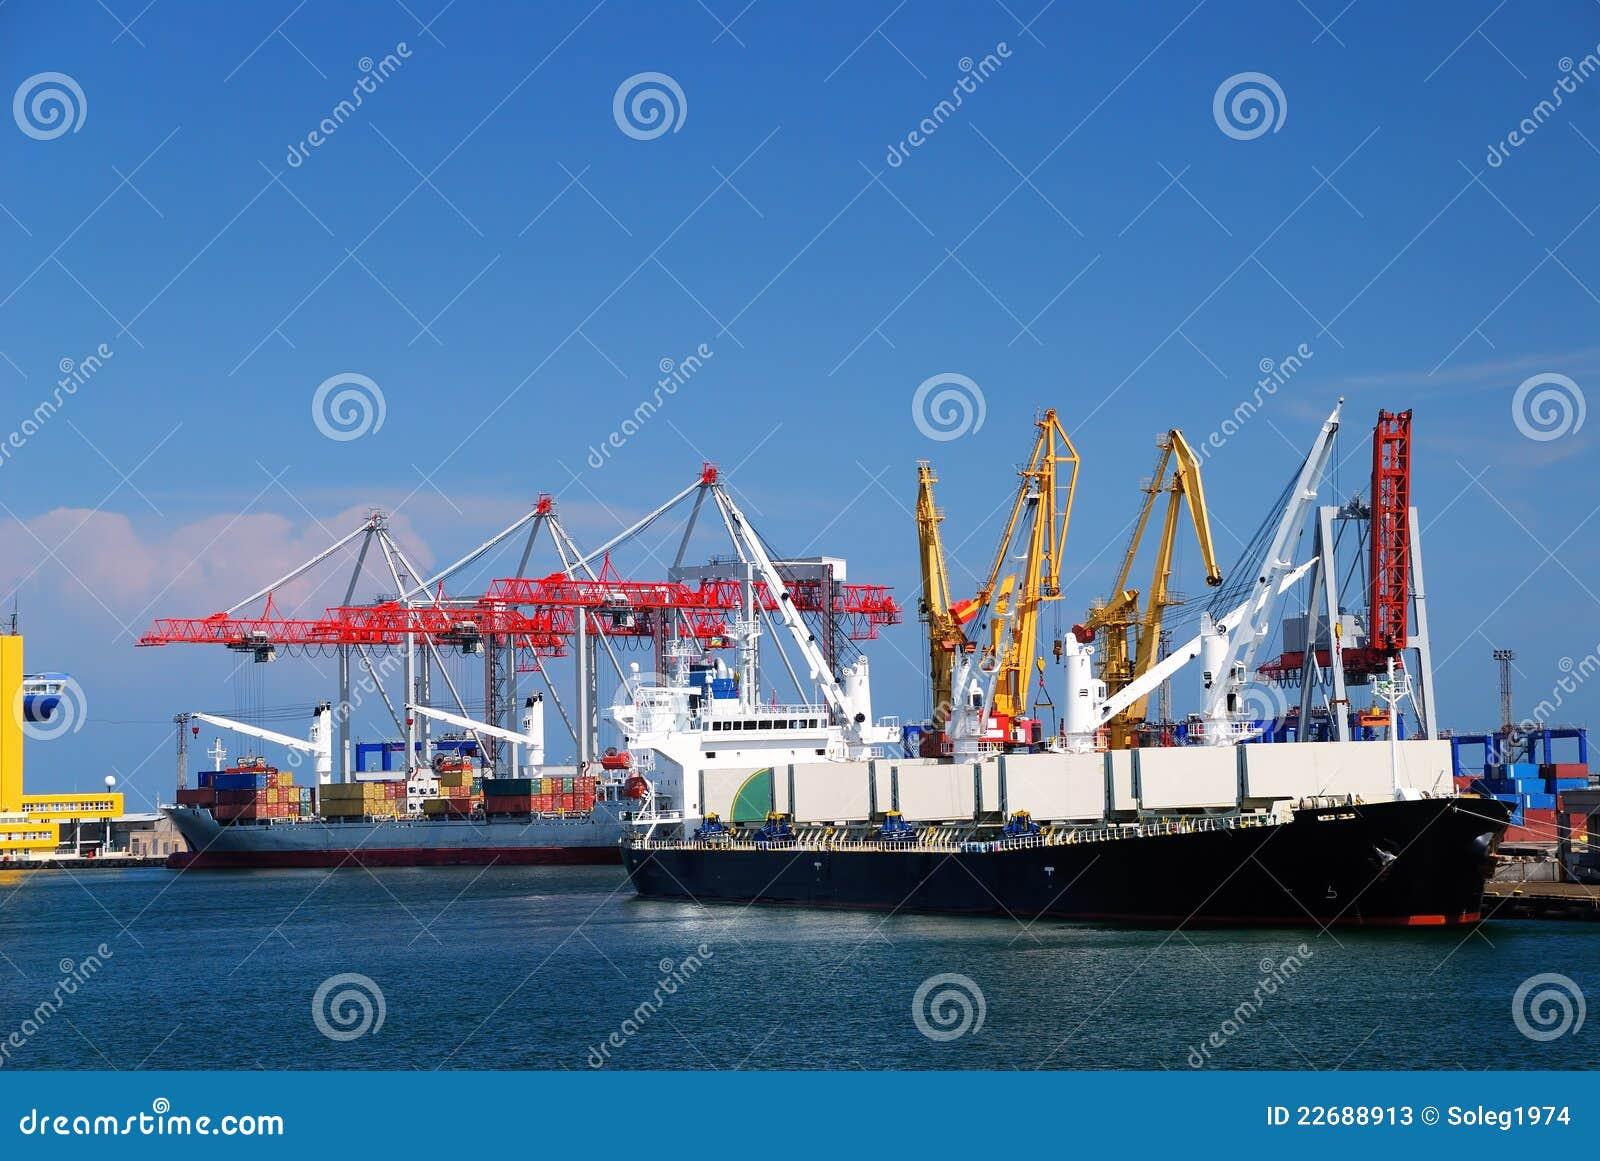 Frachtschiff im Kanal